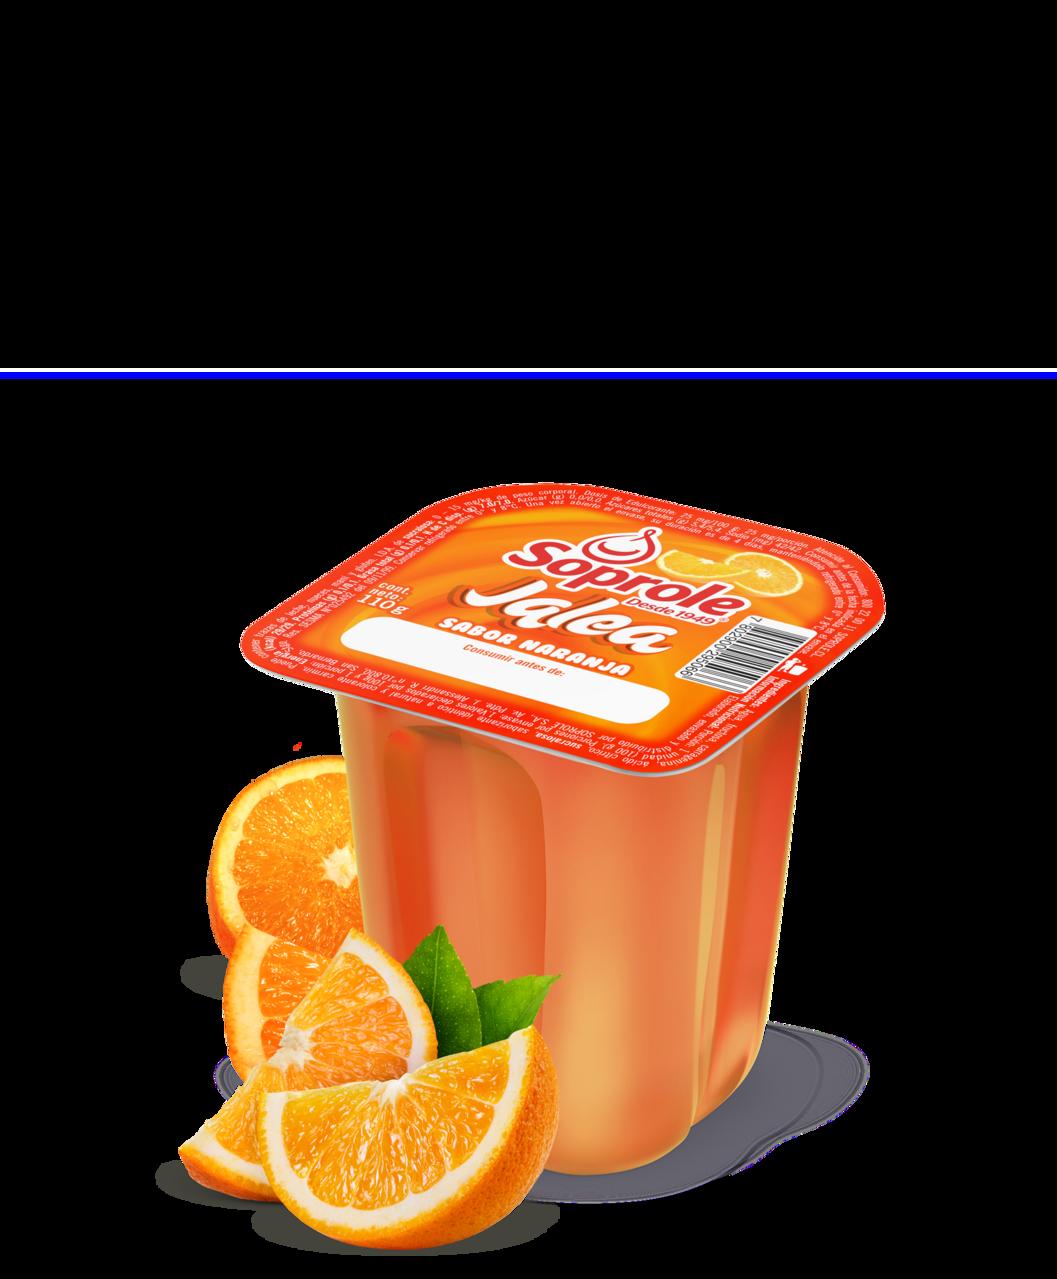 Soprole Jalea sabor Naranja